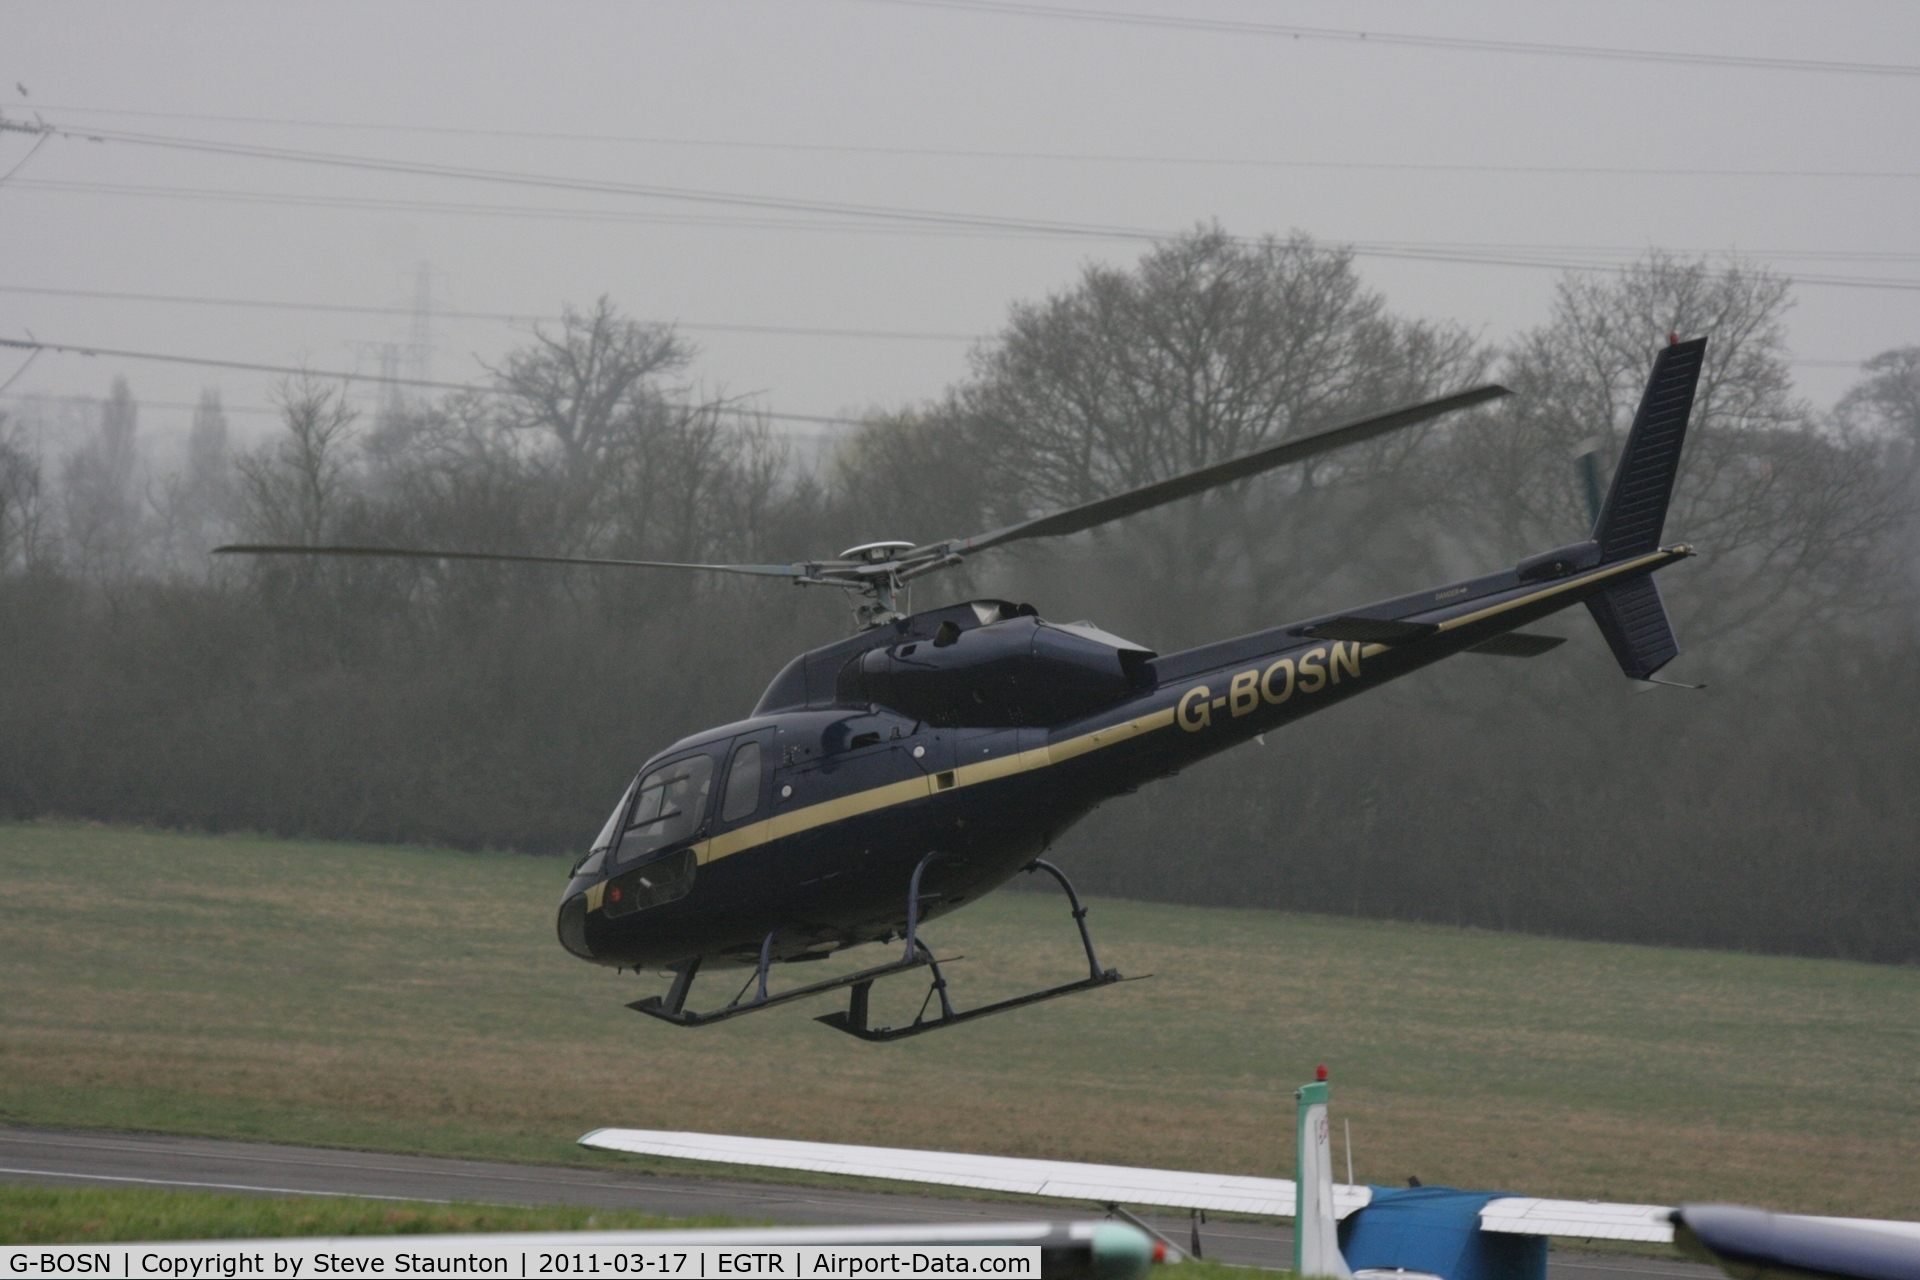 G-BOSN, 1982 Aerospatiale AS-355F-1 Ecureuil 2 C/N 5266, Taken at Elstree Airfield March 2011